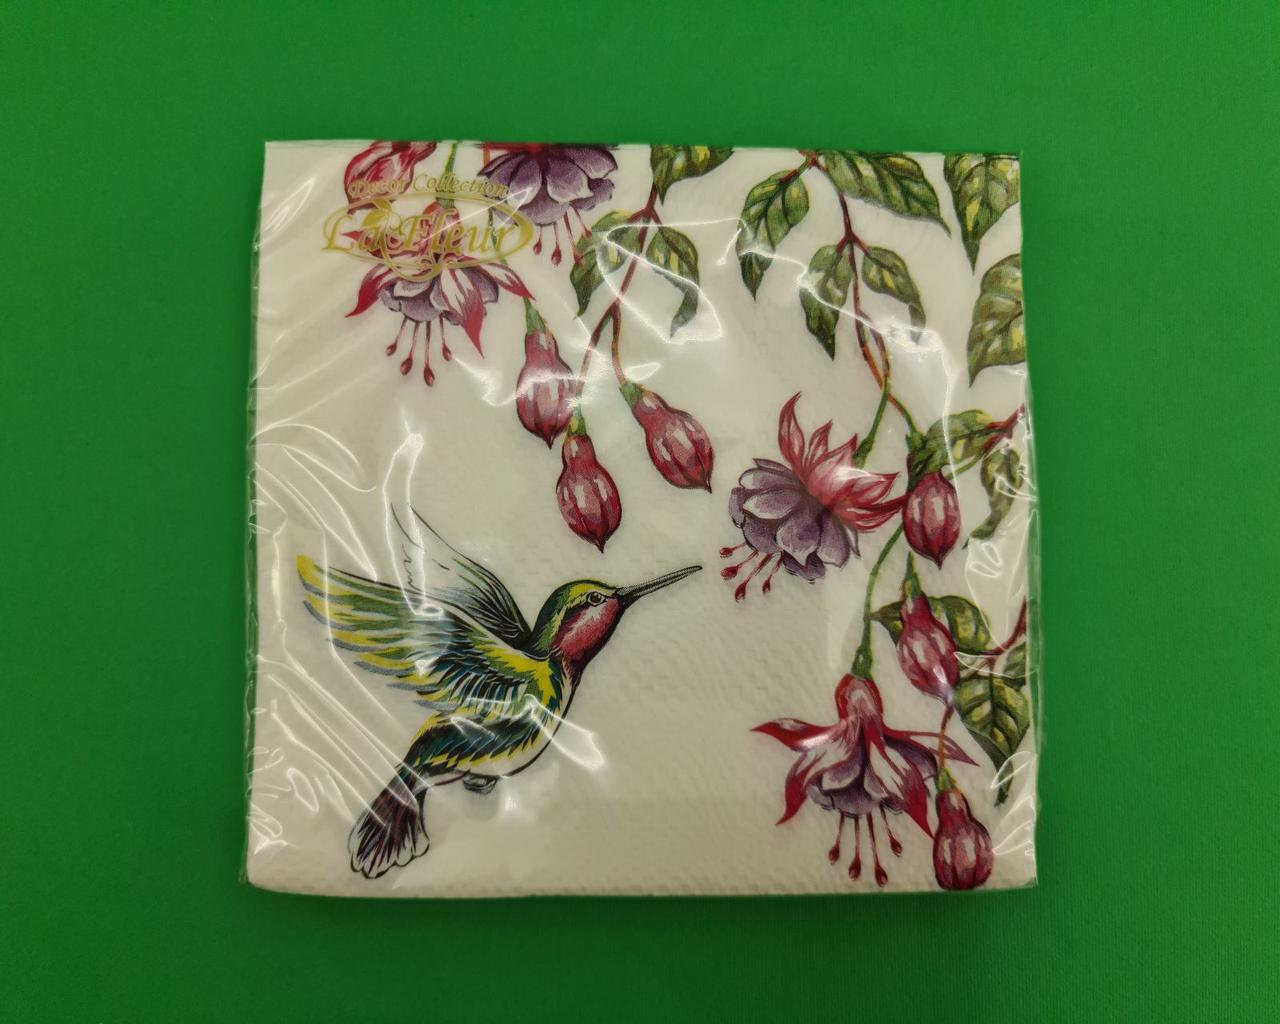 Салфетка декор (ЗЗхЗЗ, 20шт)  La Fleur Колибри (1 пач)